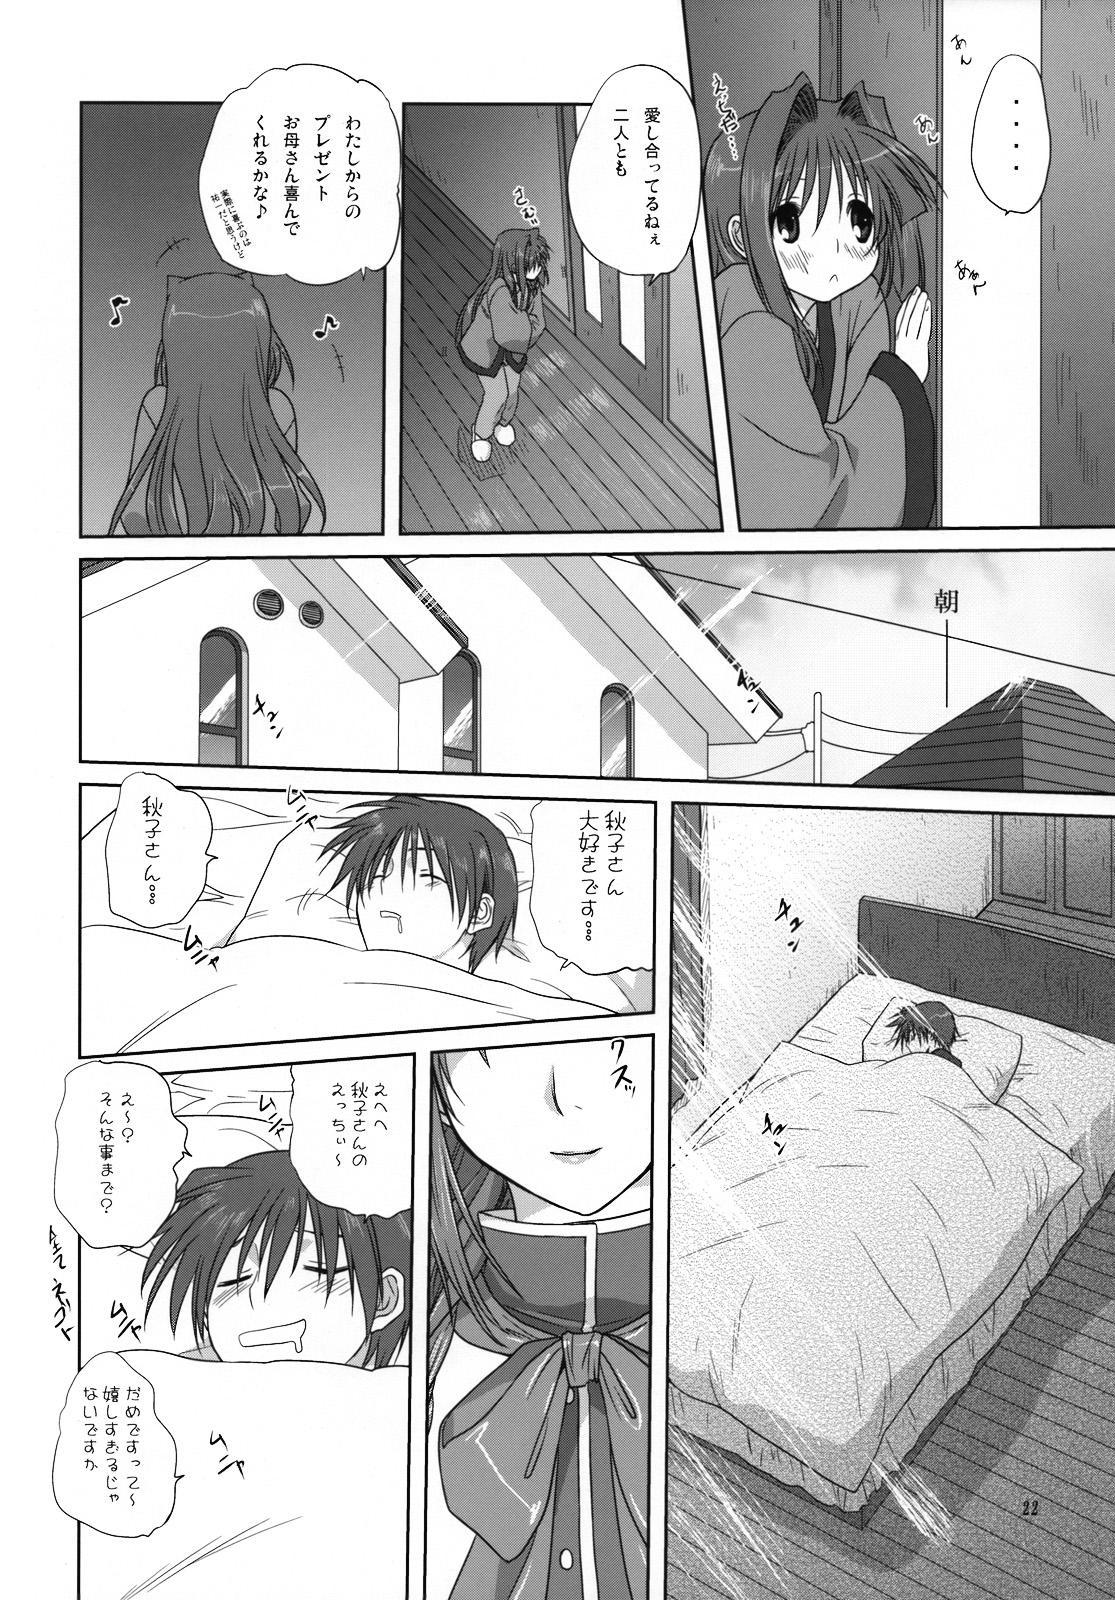 Akiko-san to Issho 3 20